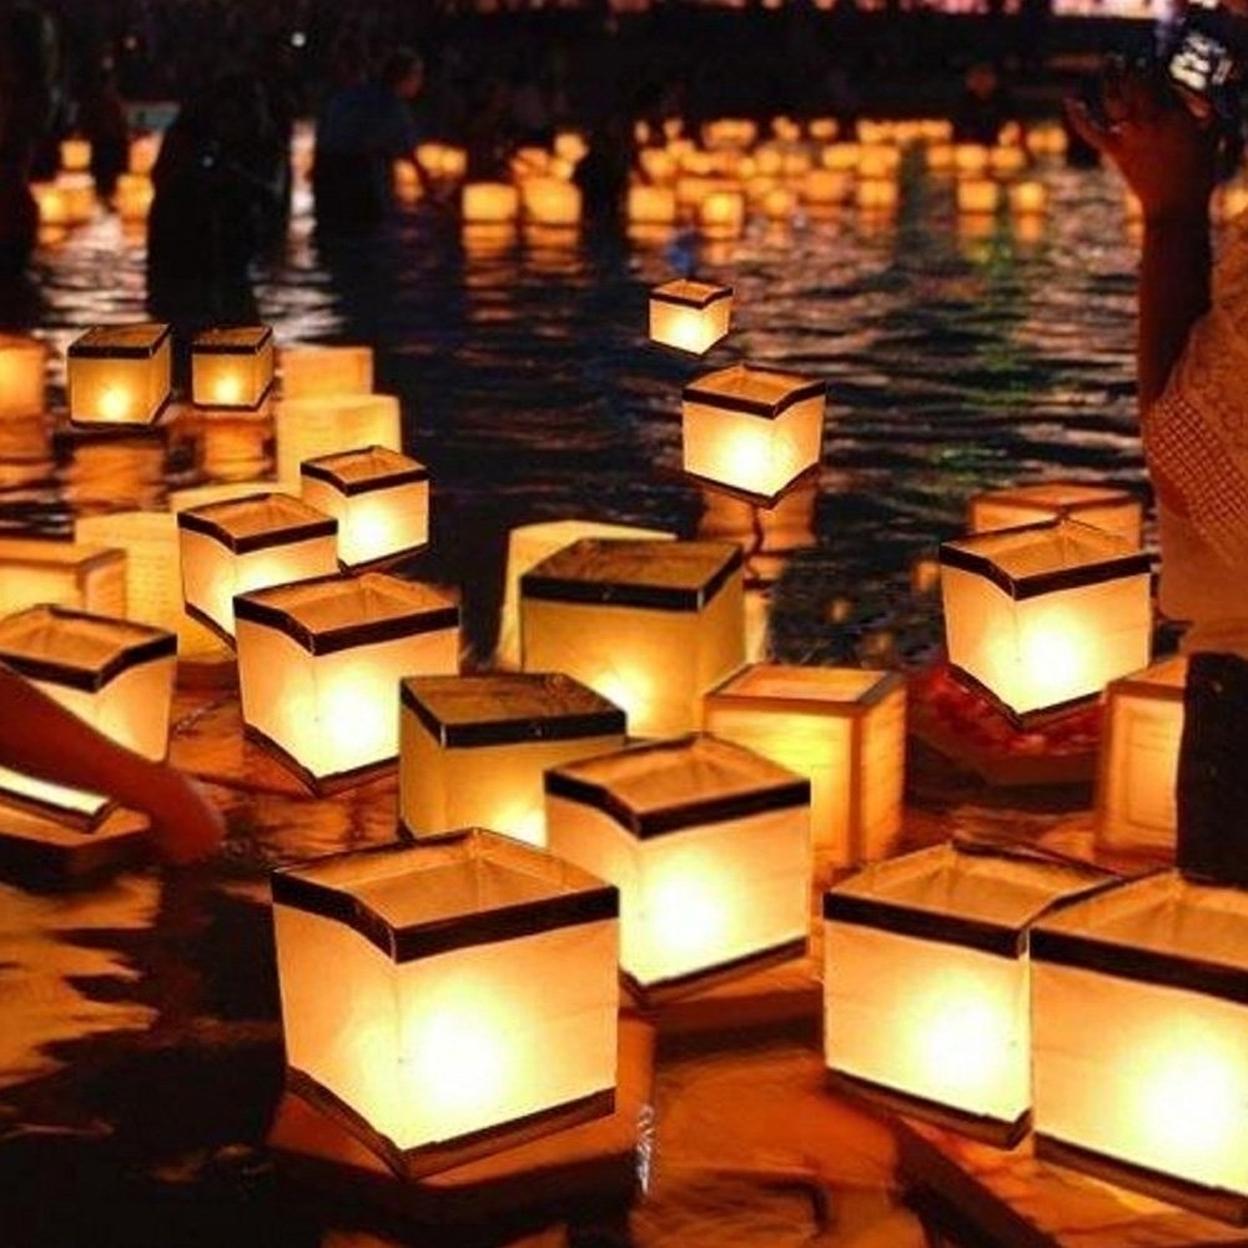 10 Pack: Water Floating Candle Lanterns Biodegradable 59f5f4a1e224615b7e37575e